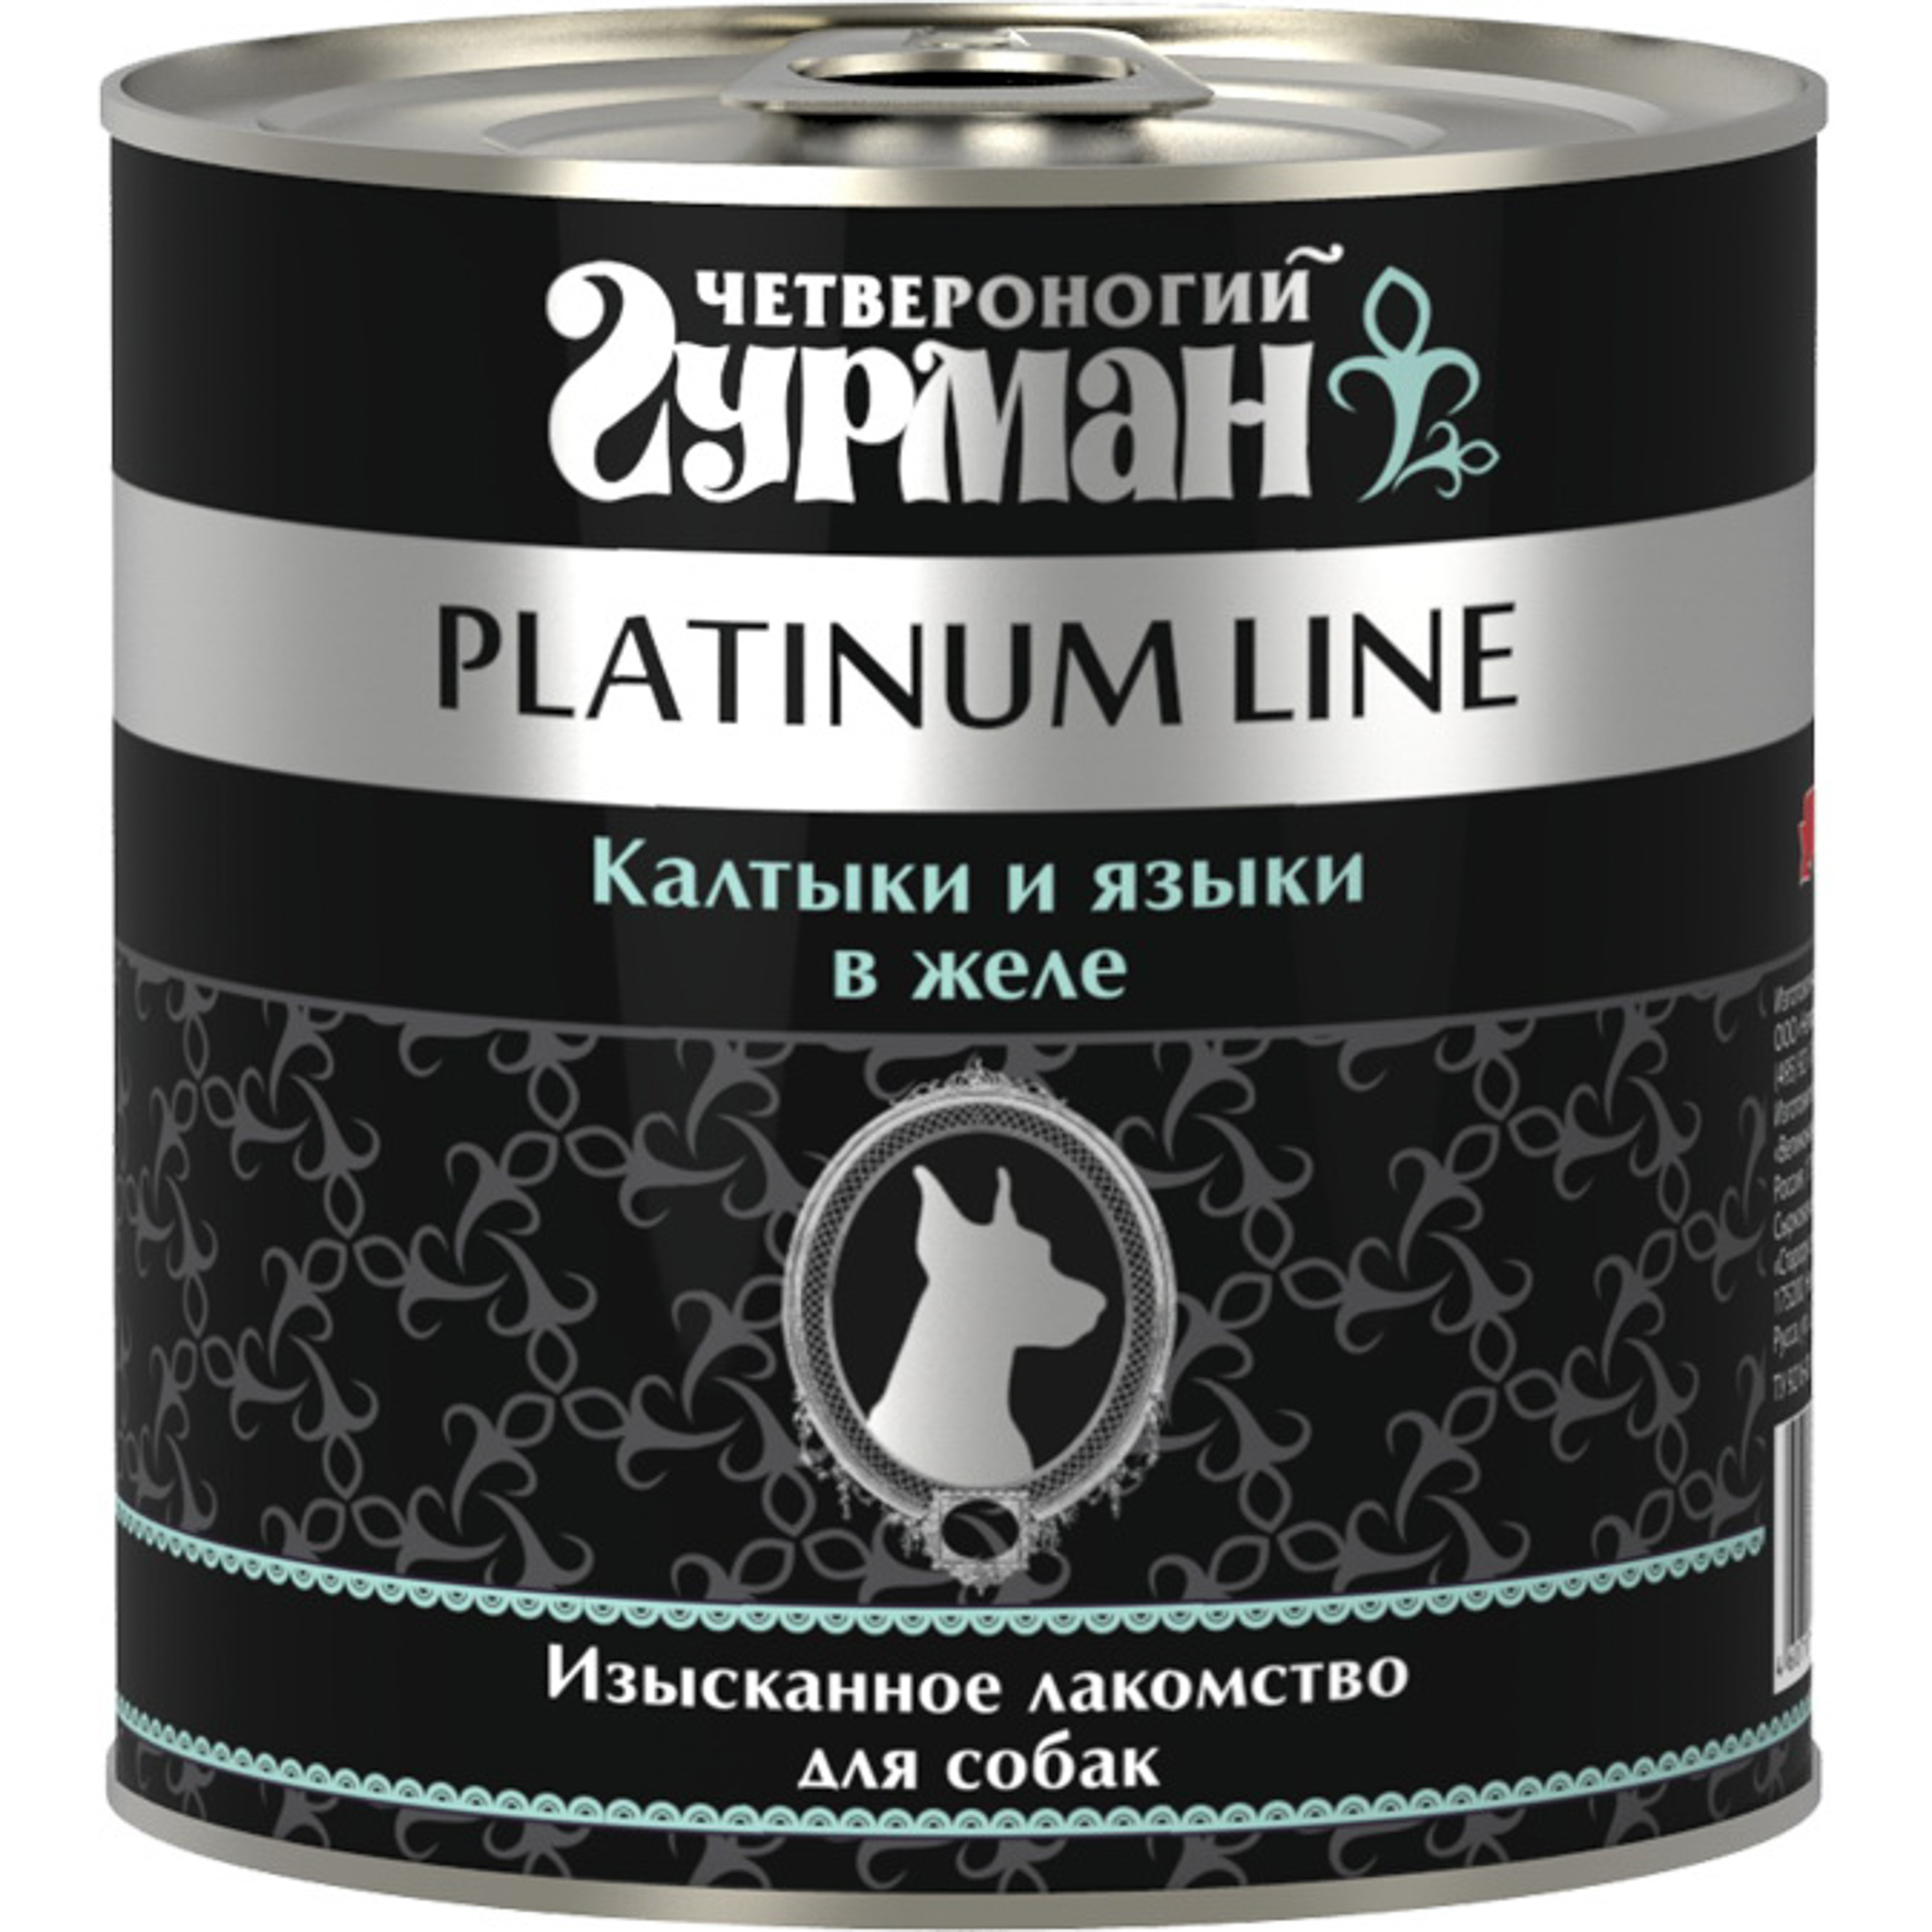 Корм для собак Четвероногий гурман Platinum line калтыки и языки в желе 240 г